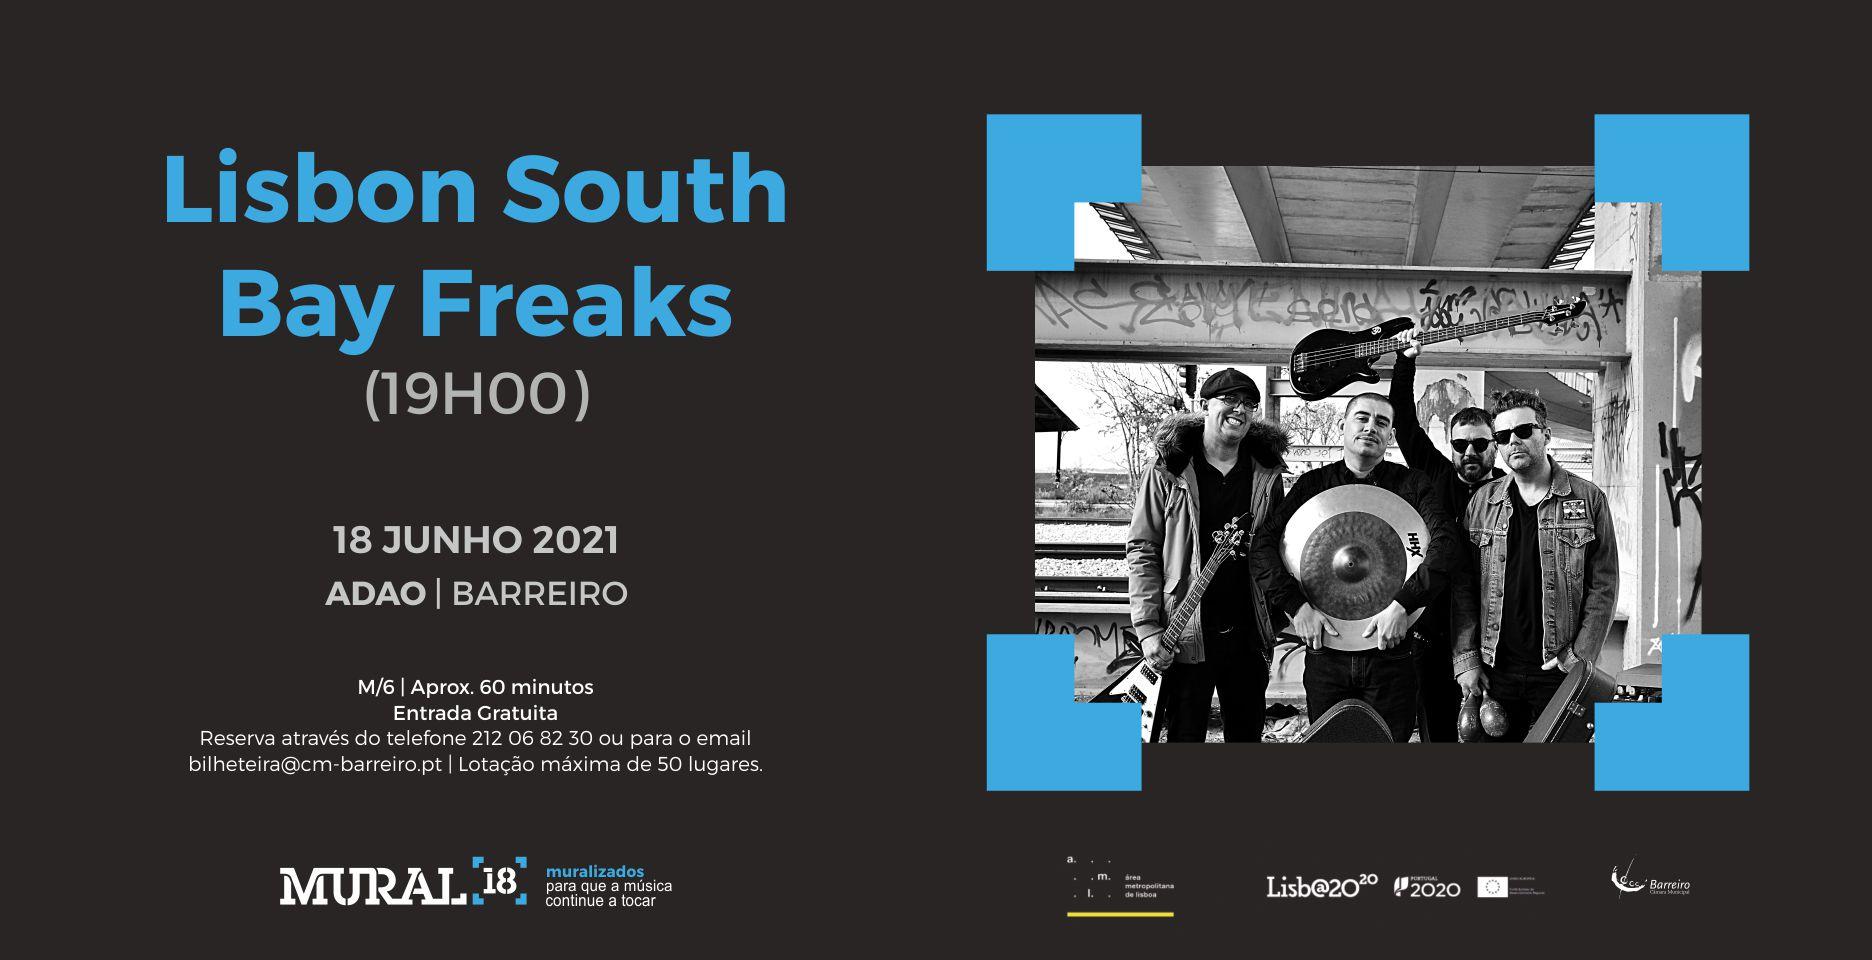 Lisbon South Bay Freaks + Monkey Cage   Concerto Programação em Rede MURAL 18